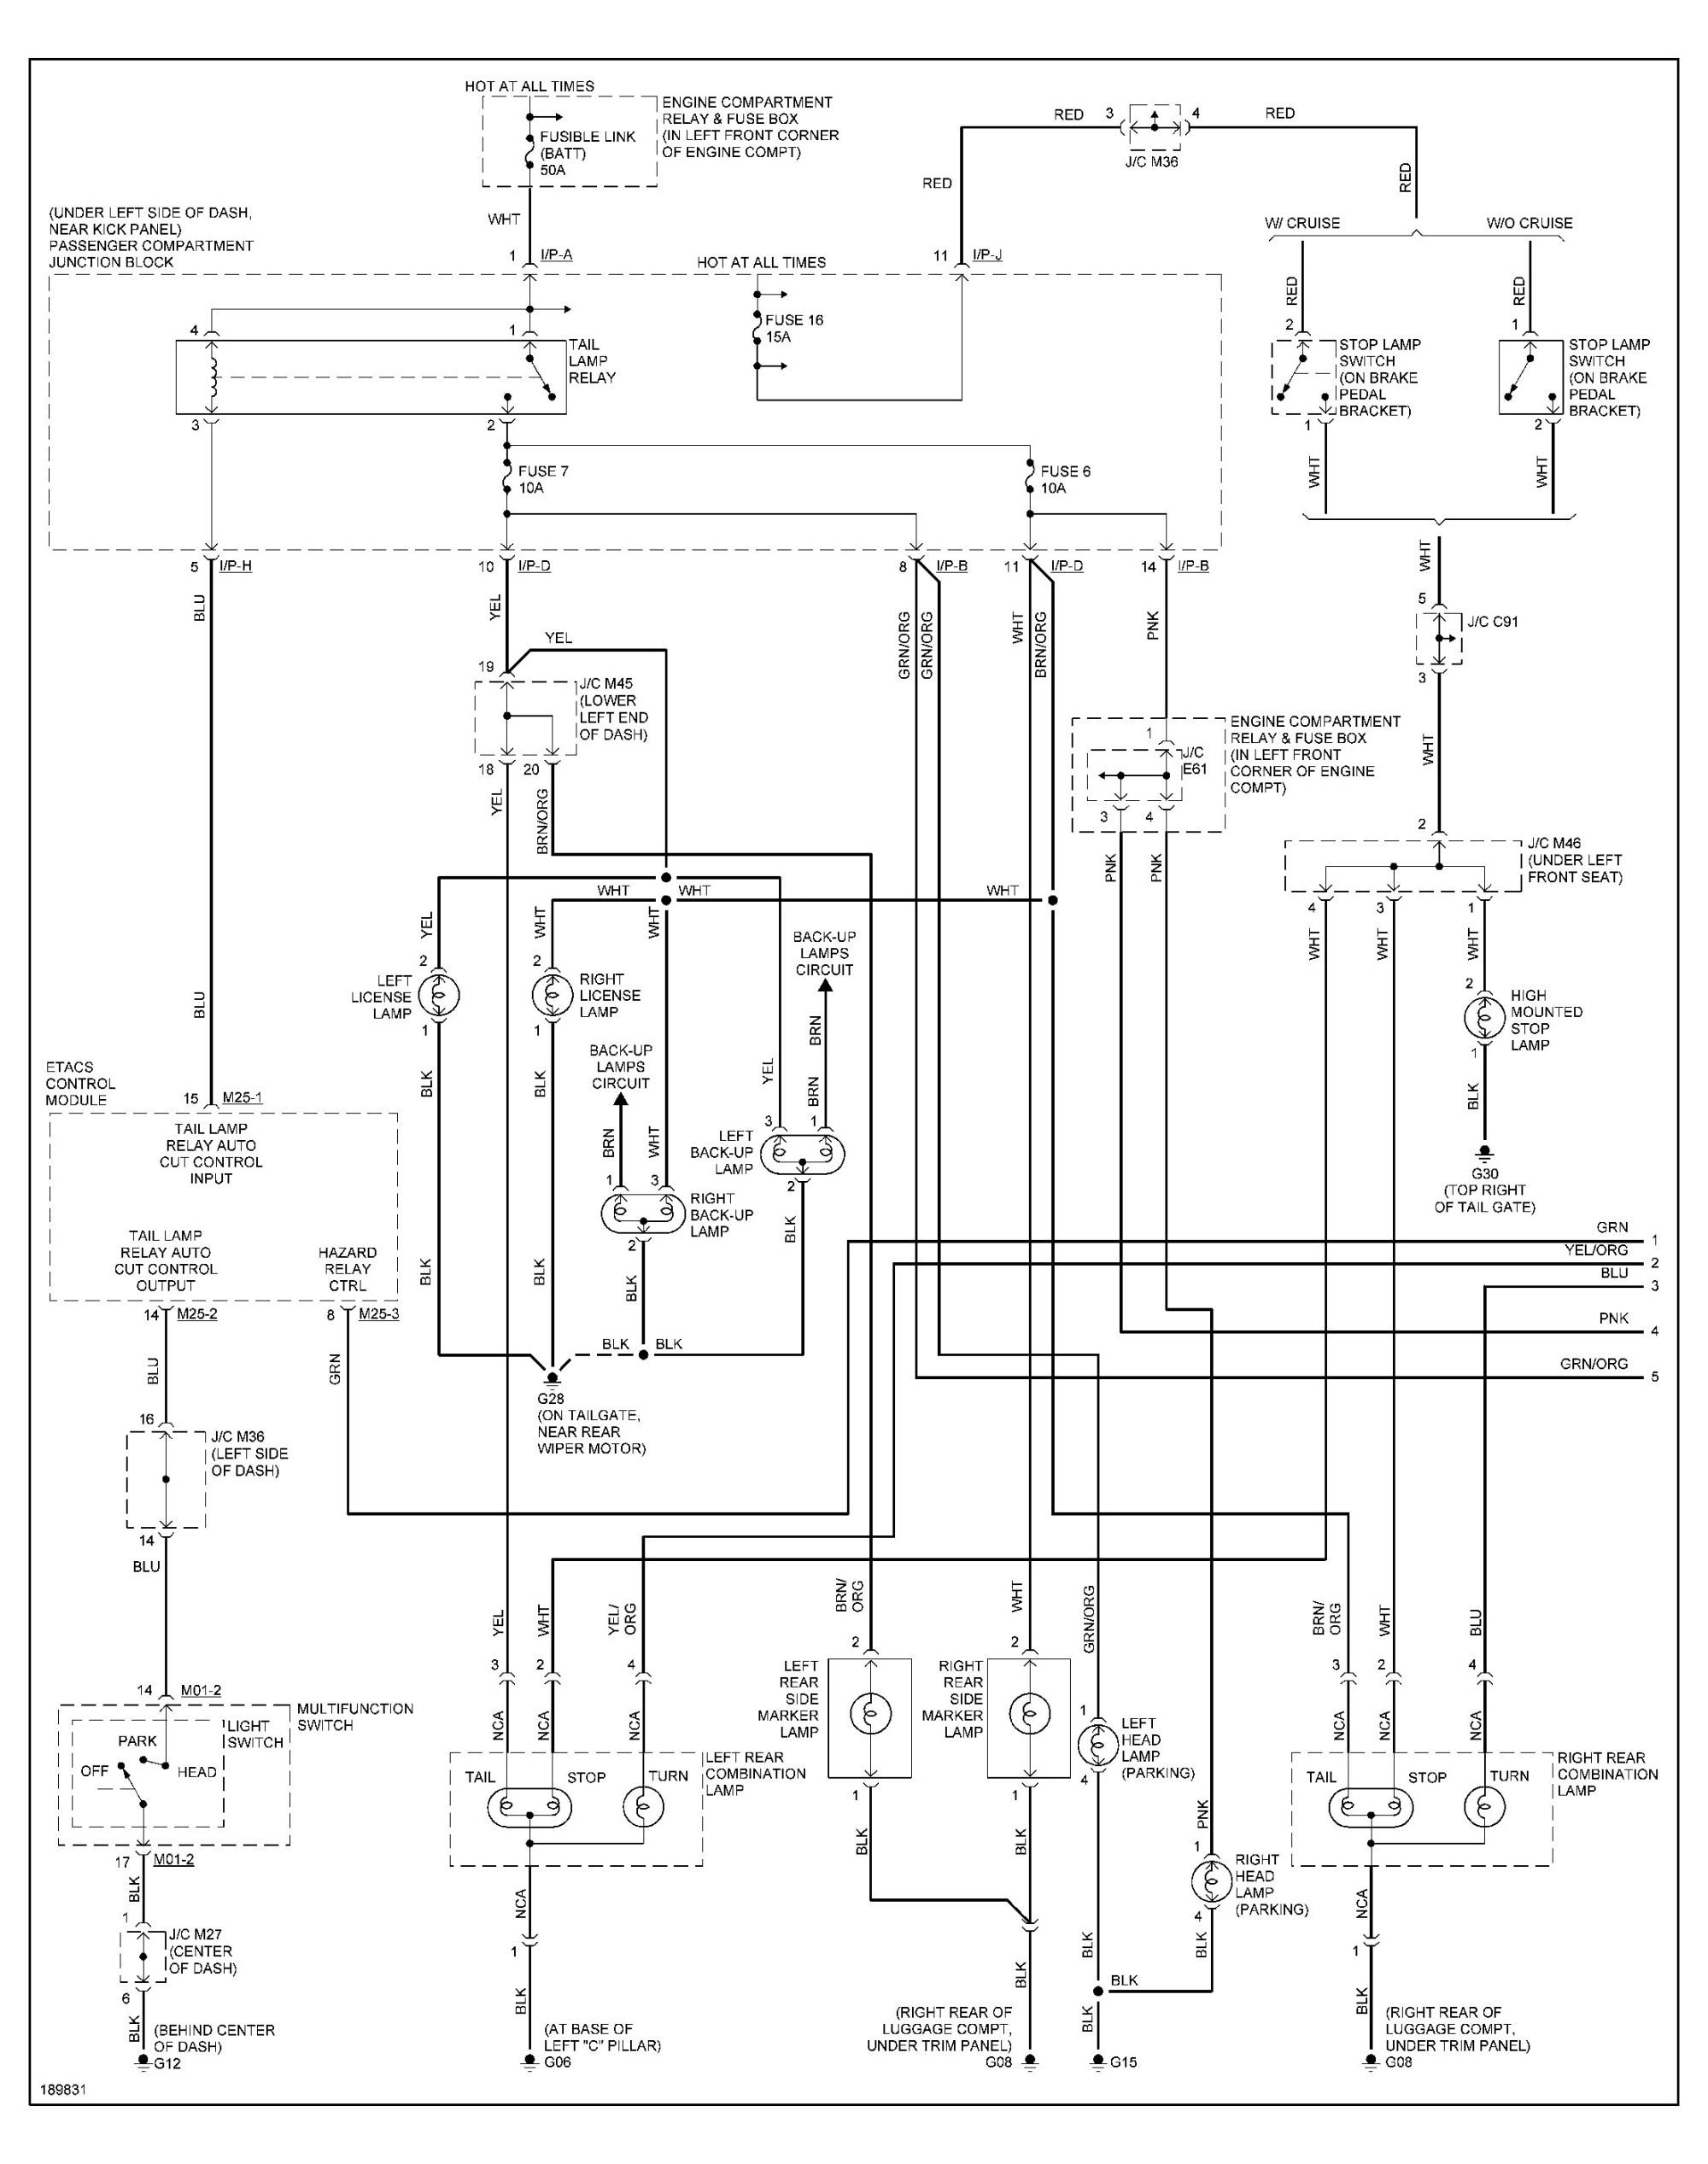 hight resolution of 2000 hyundai elantra engine diagram 2005 hyundai accent engine diagram car 04 hyundai accent engine of